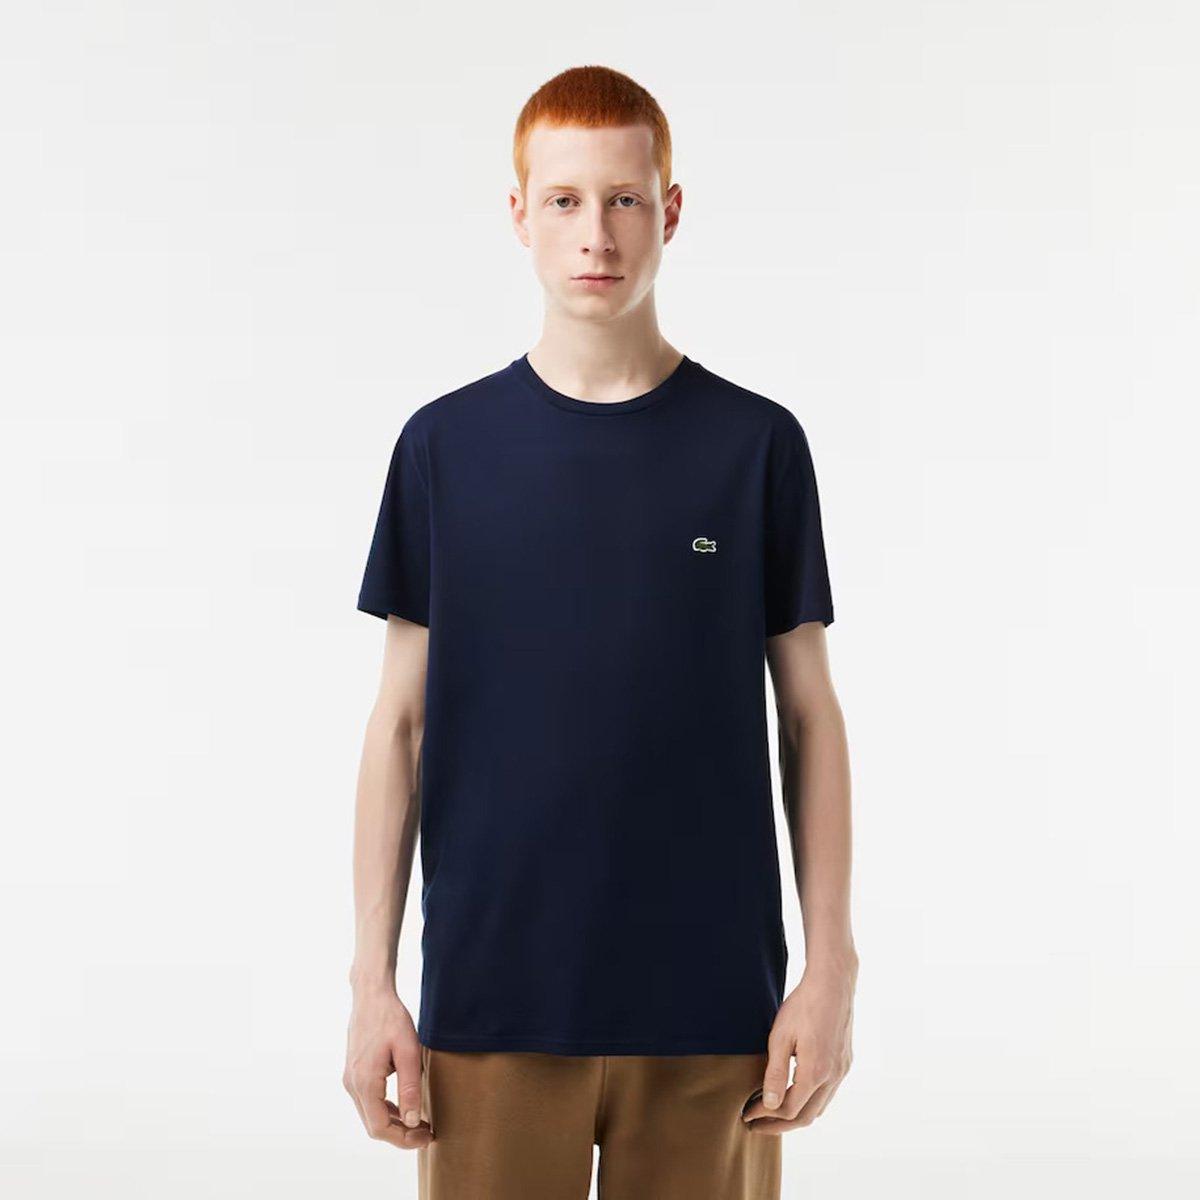 18c16d18239 FornecedorNetshoes. Camiseta Lacoste Básica Jersey Masculina